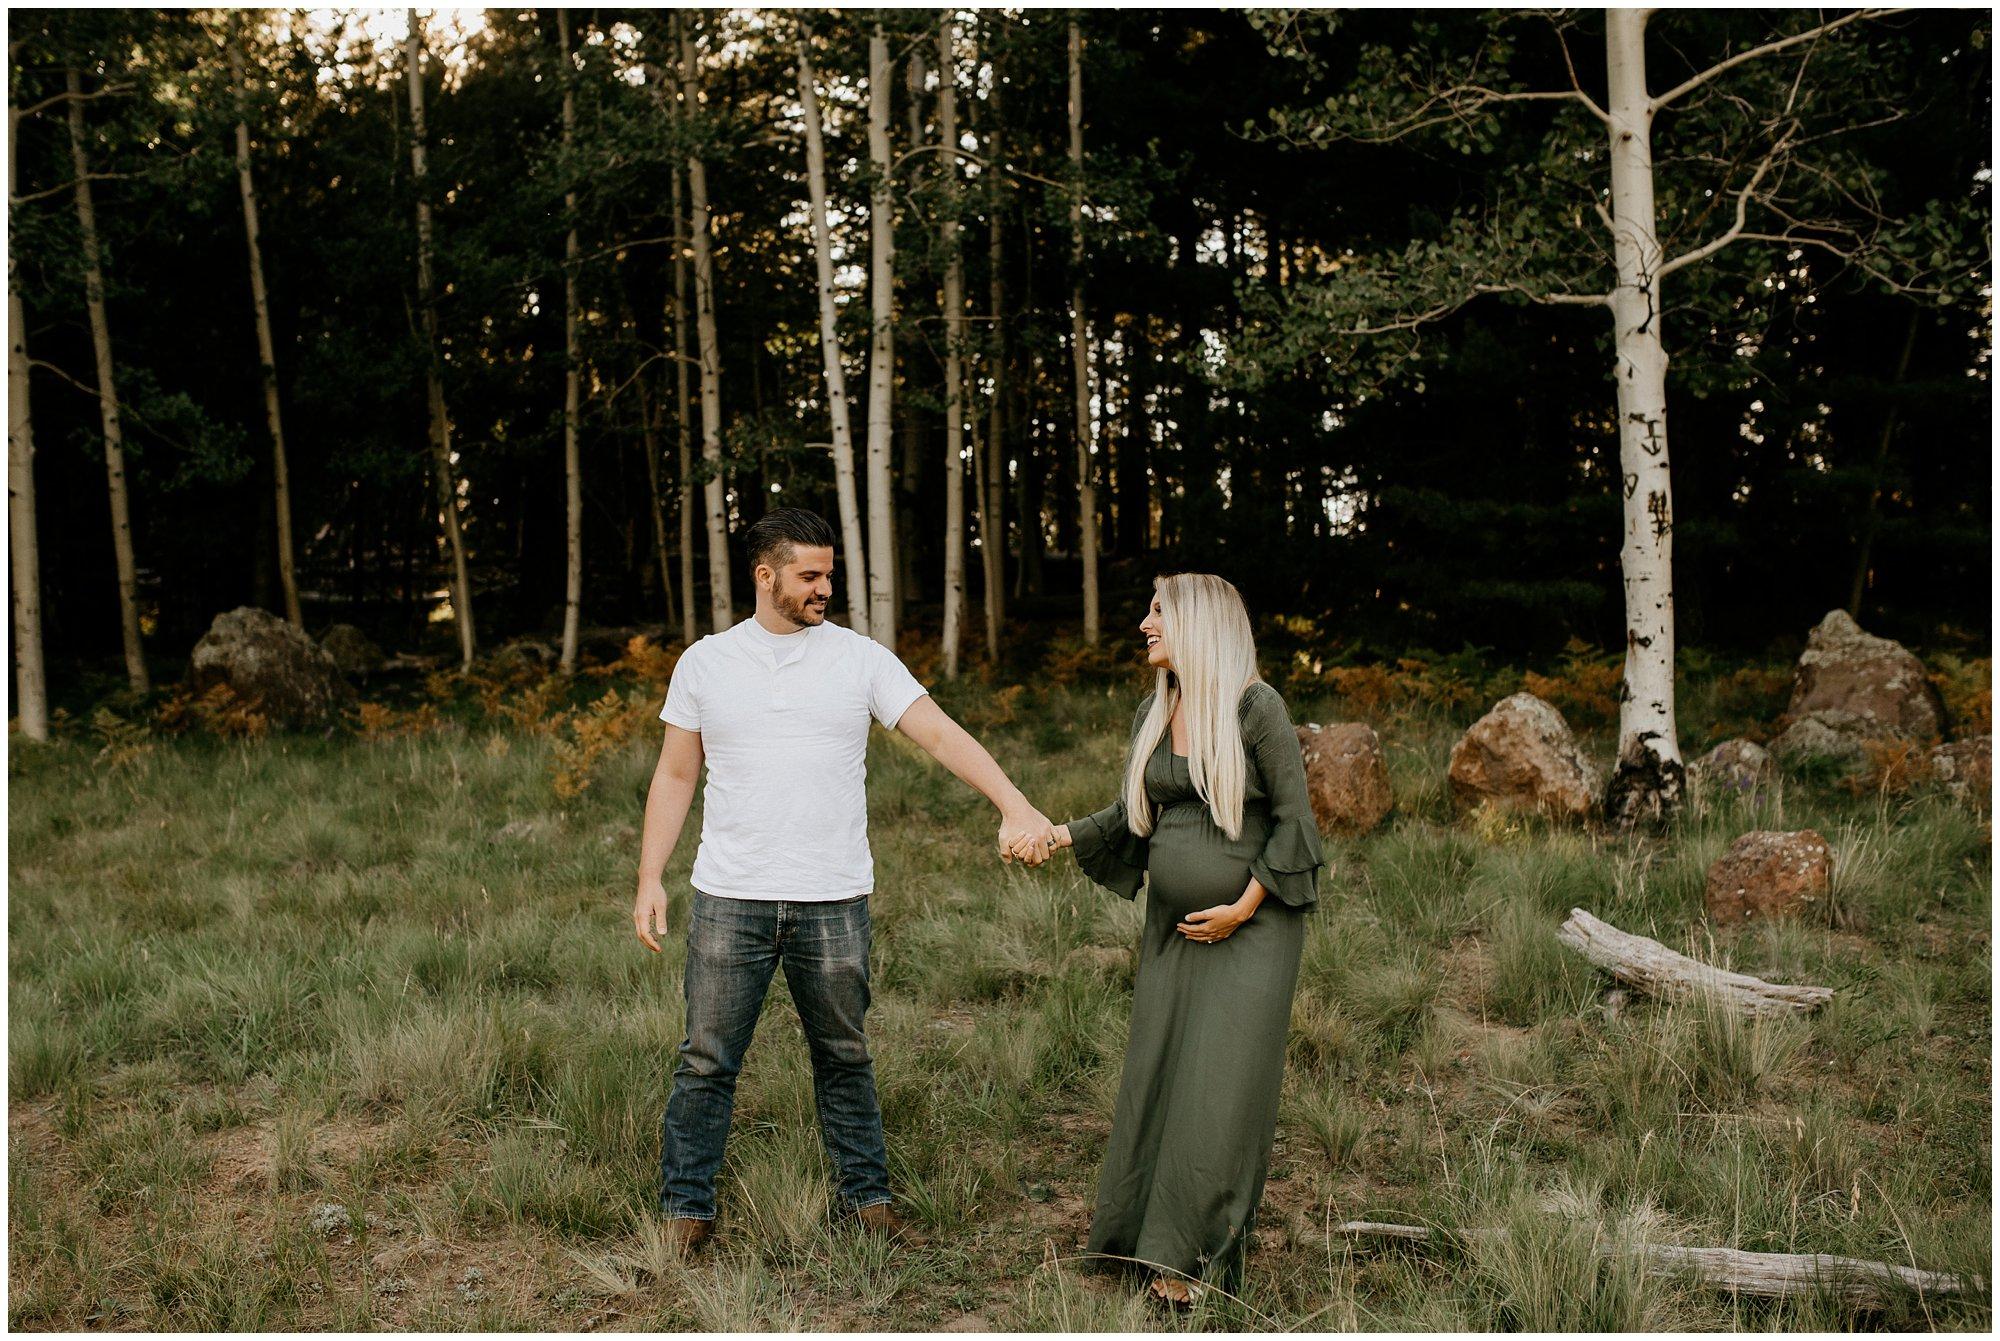 Flagstaff Aspen Tree Portrait Session - Gabby + Gary - Ashtyn Nicole Photo_0004.jpg